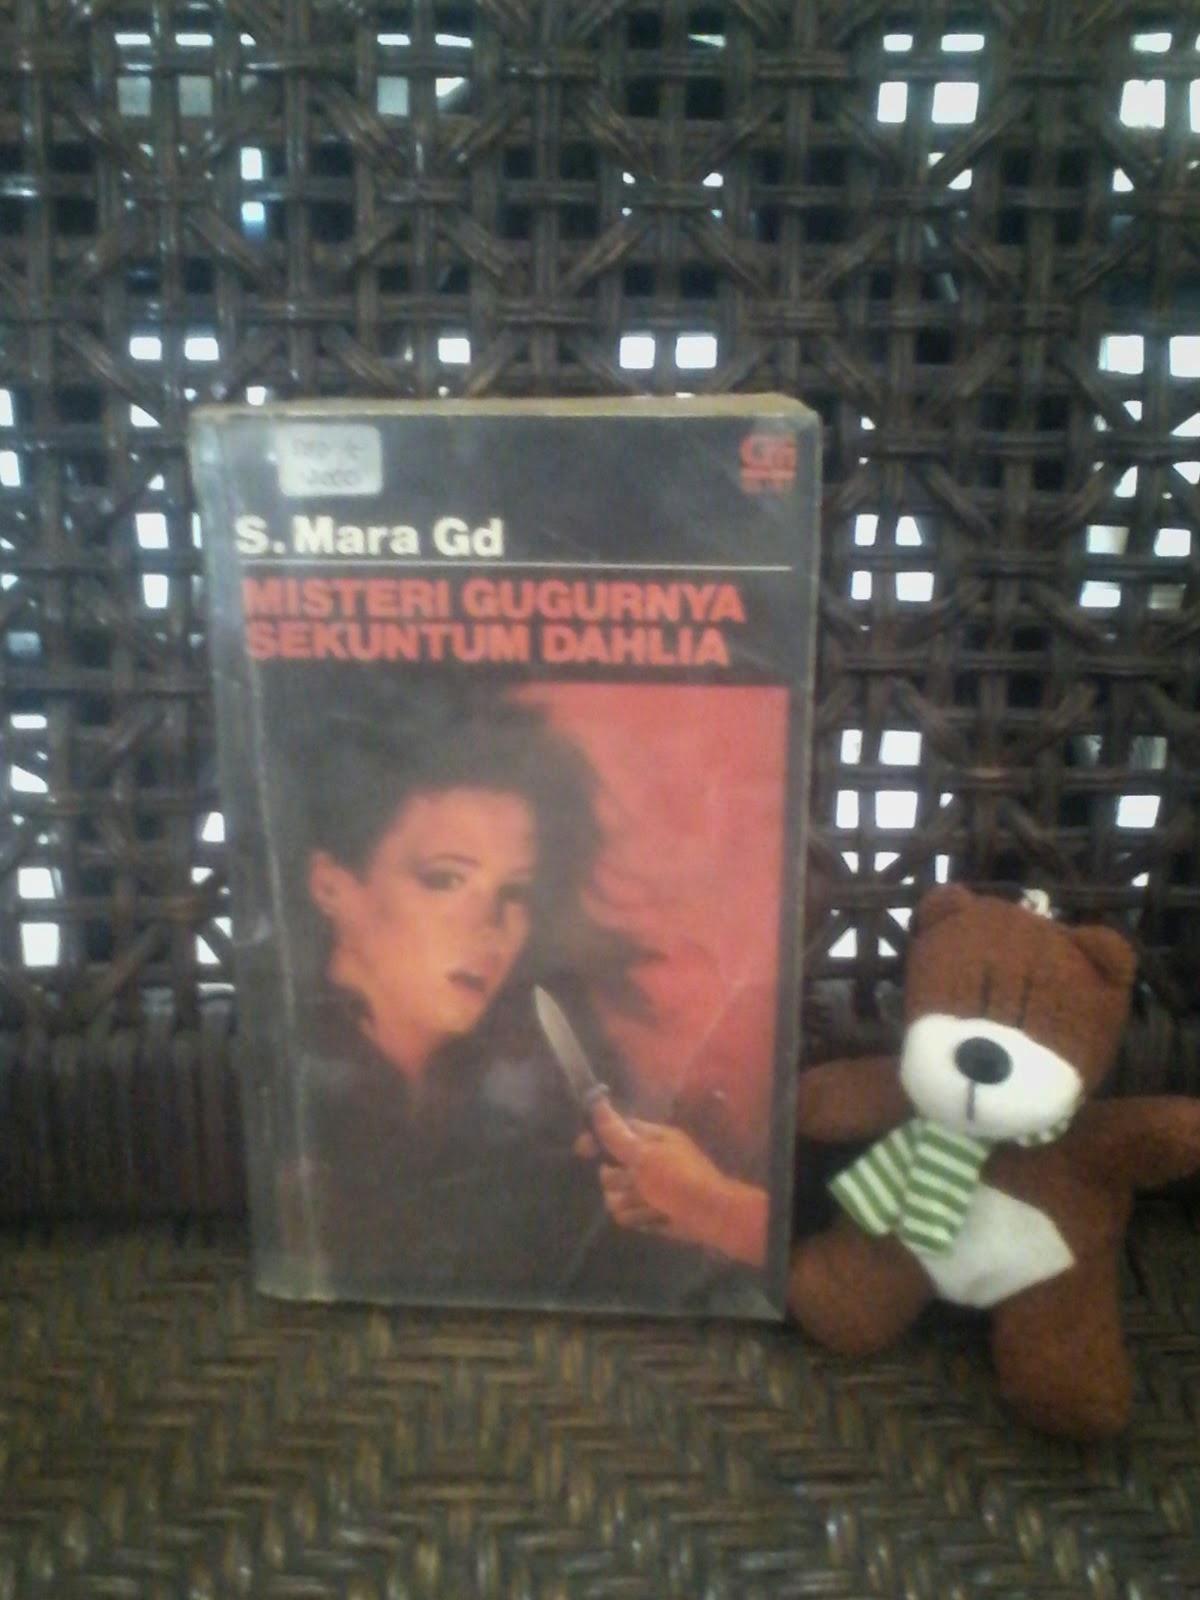 Maret 2014 Buku Beruang Misteri Mayat Yang Berpindah By Smara Gd Obral Gugurnya Sekuntum Dahlia S Mara